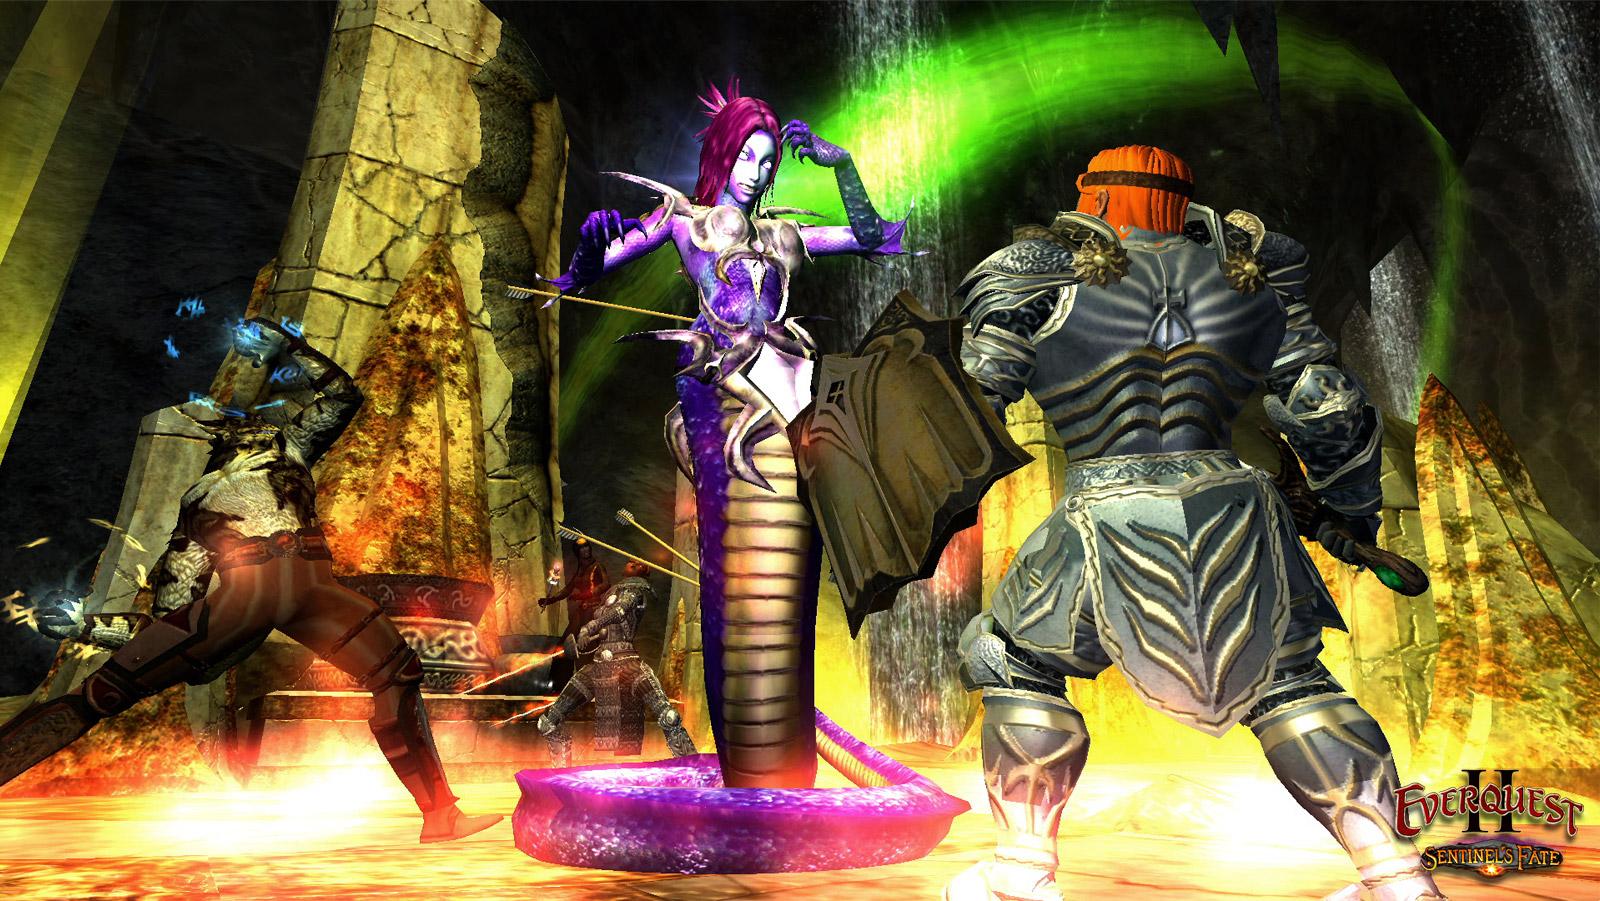 Everquest merc slot quest : The clermont gambling